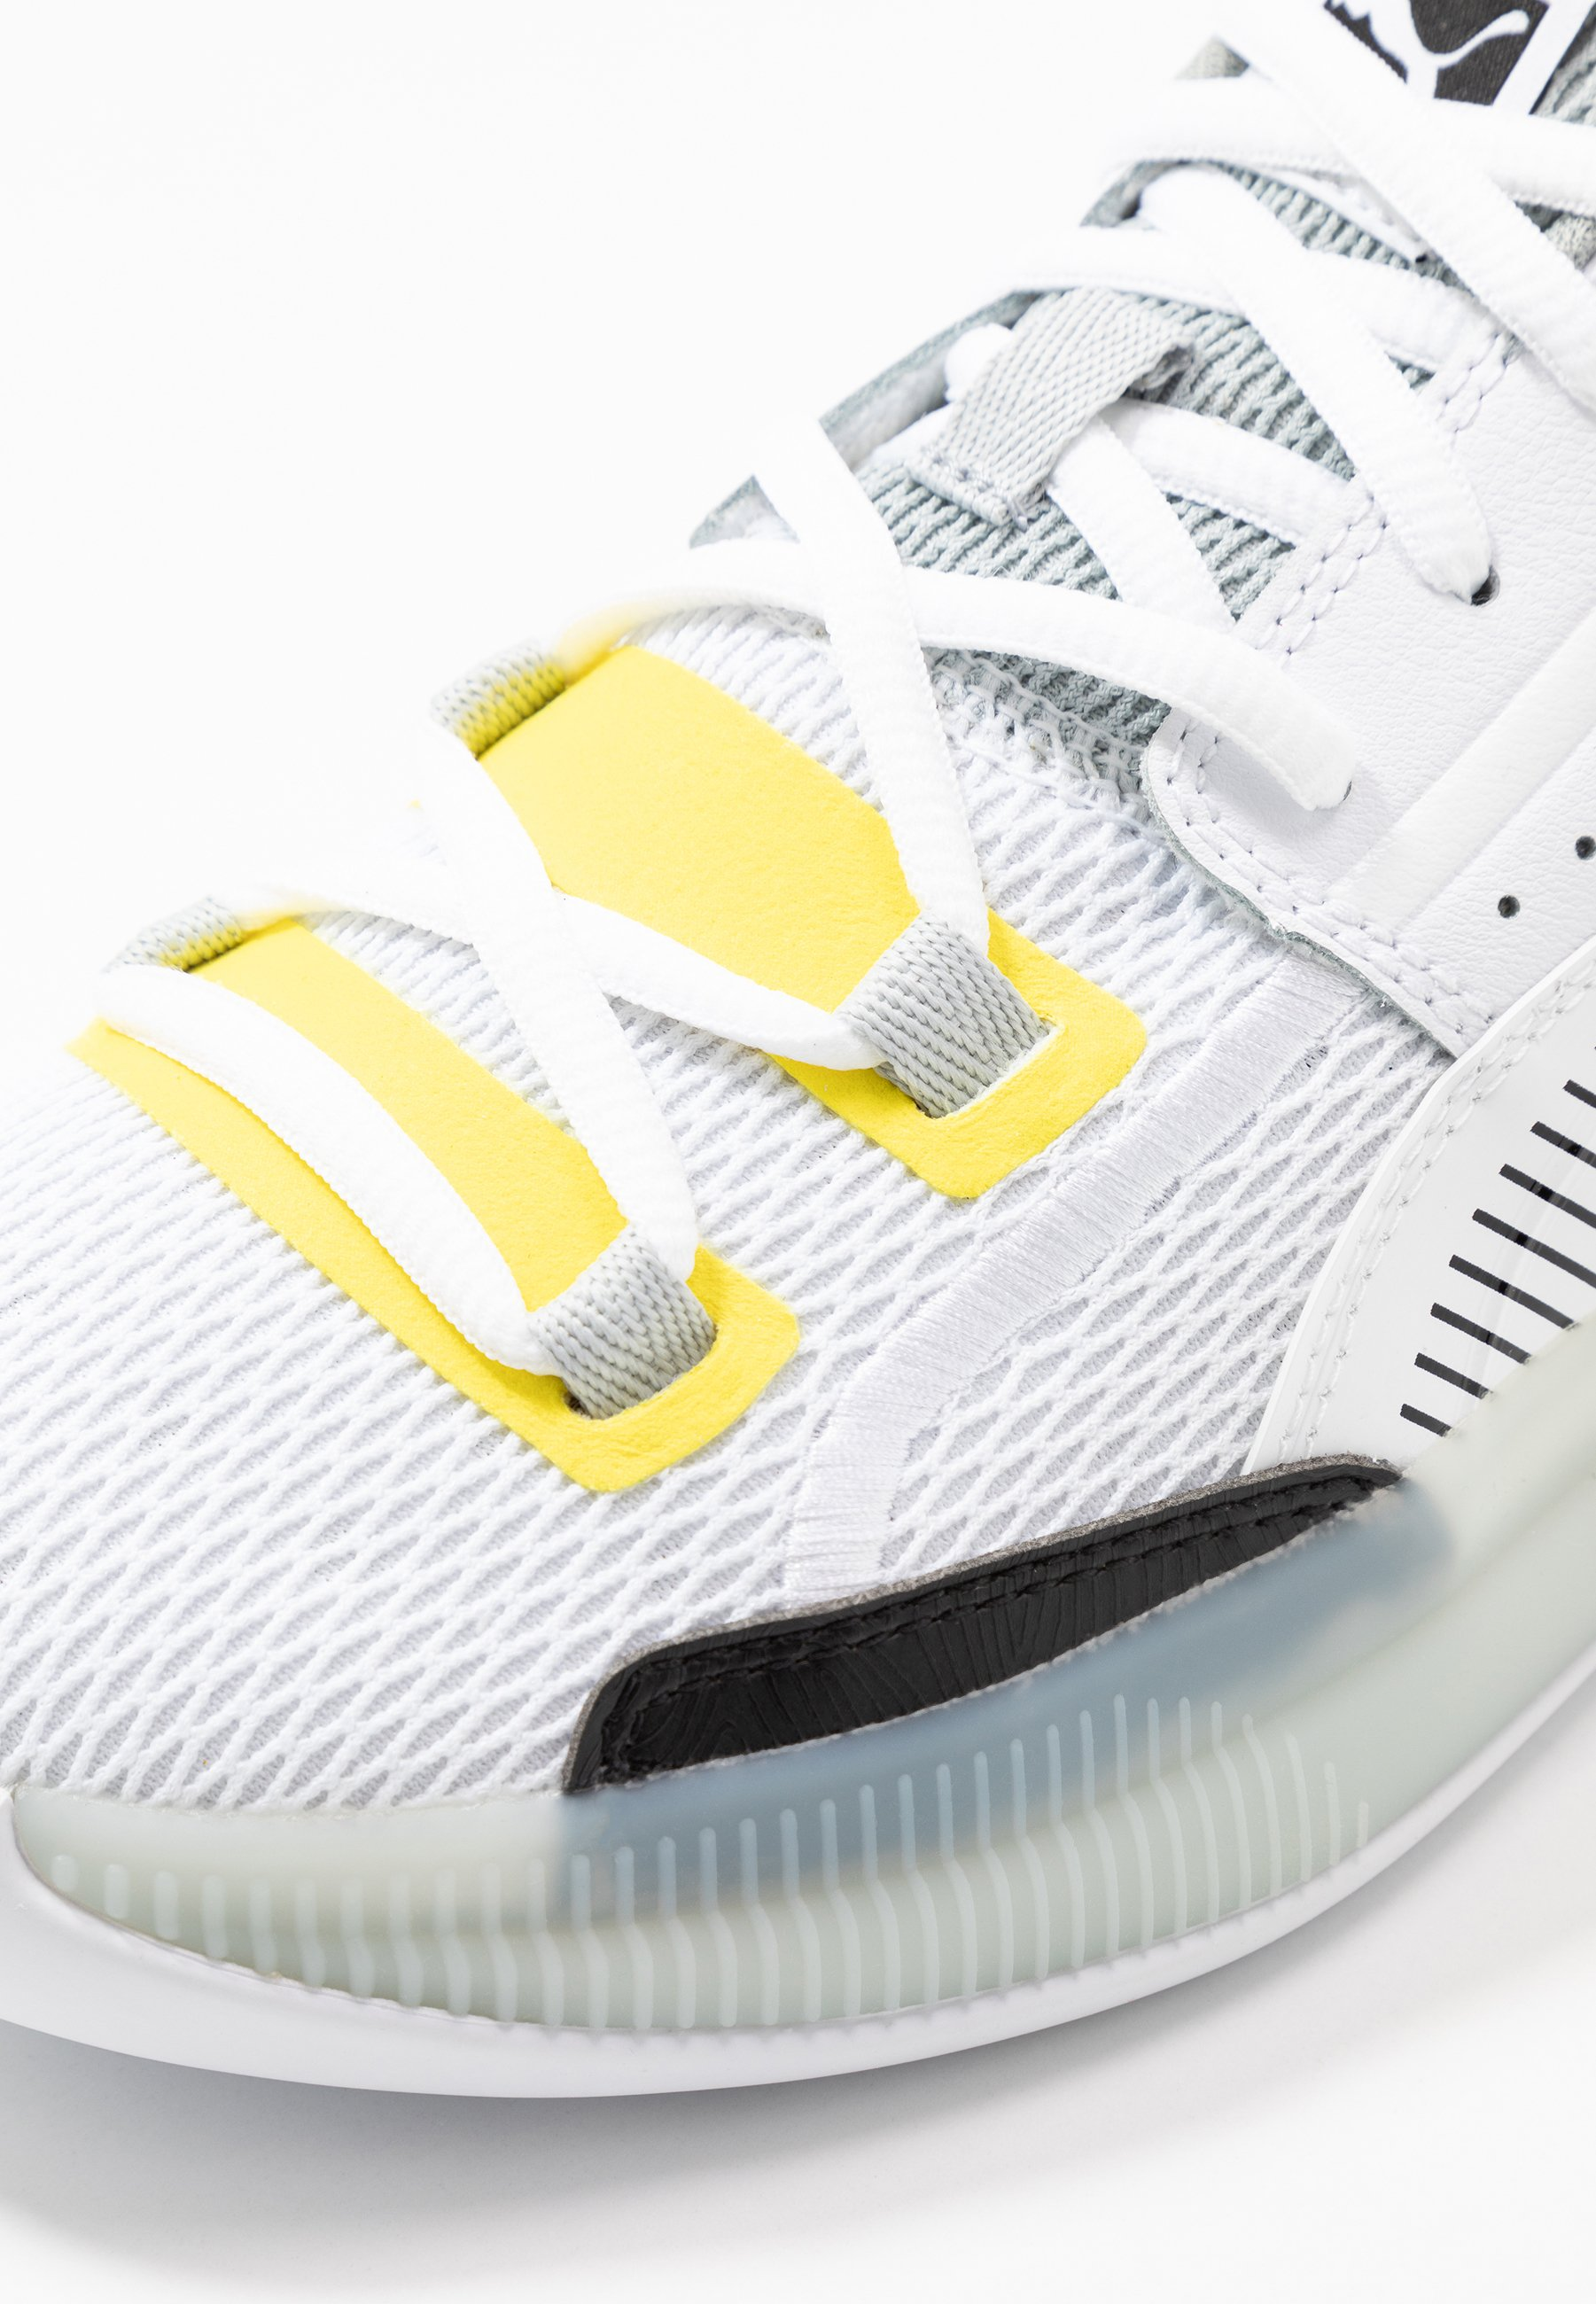 CLYDE HARDWOOD RETRO Chaussures de basket white